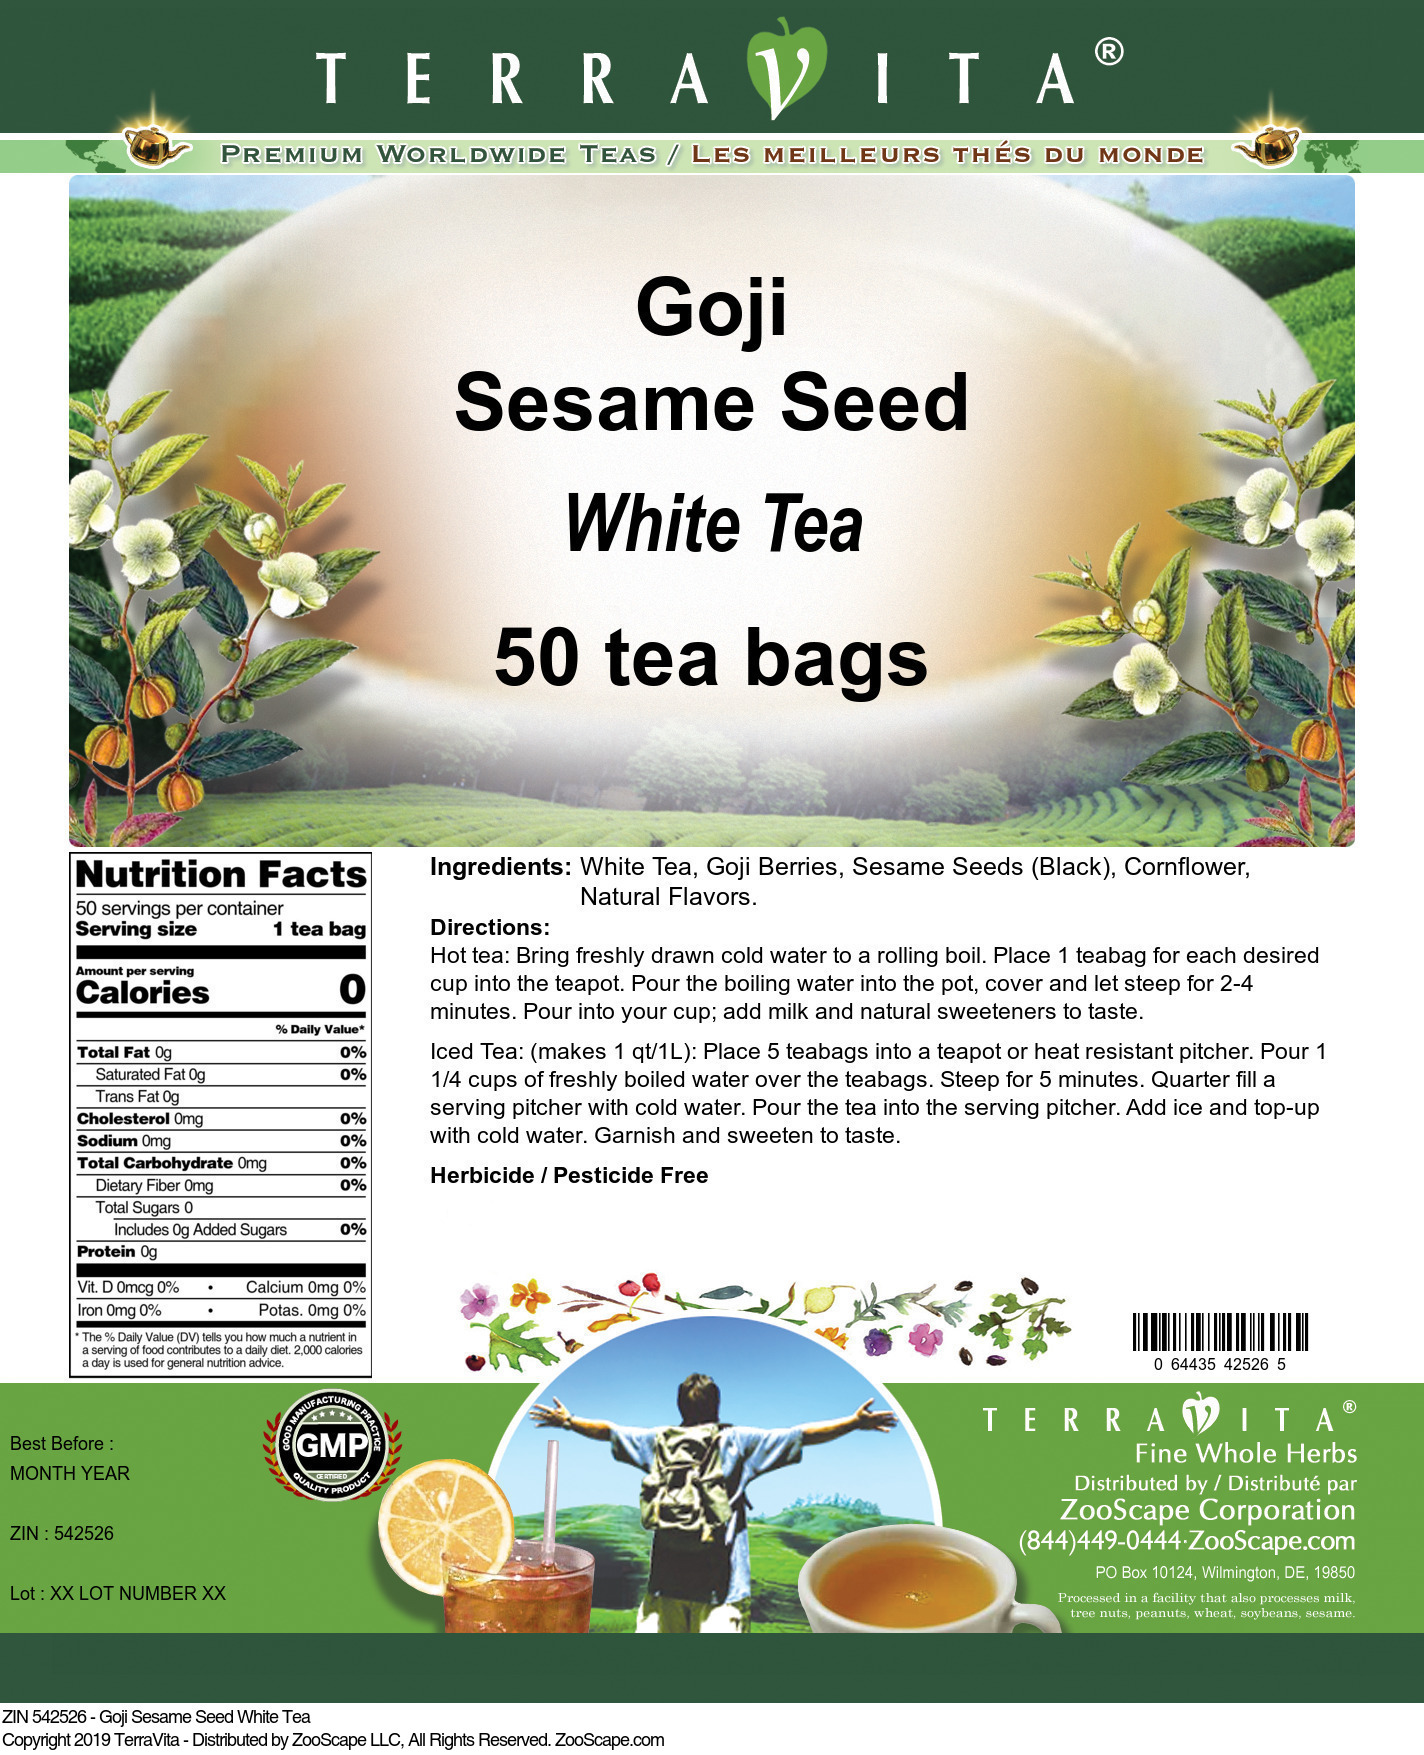 Goji Sesame Seed White Tea